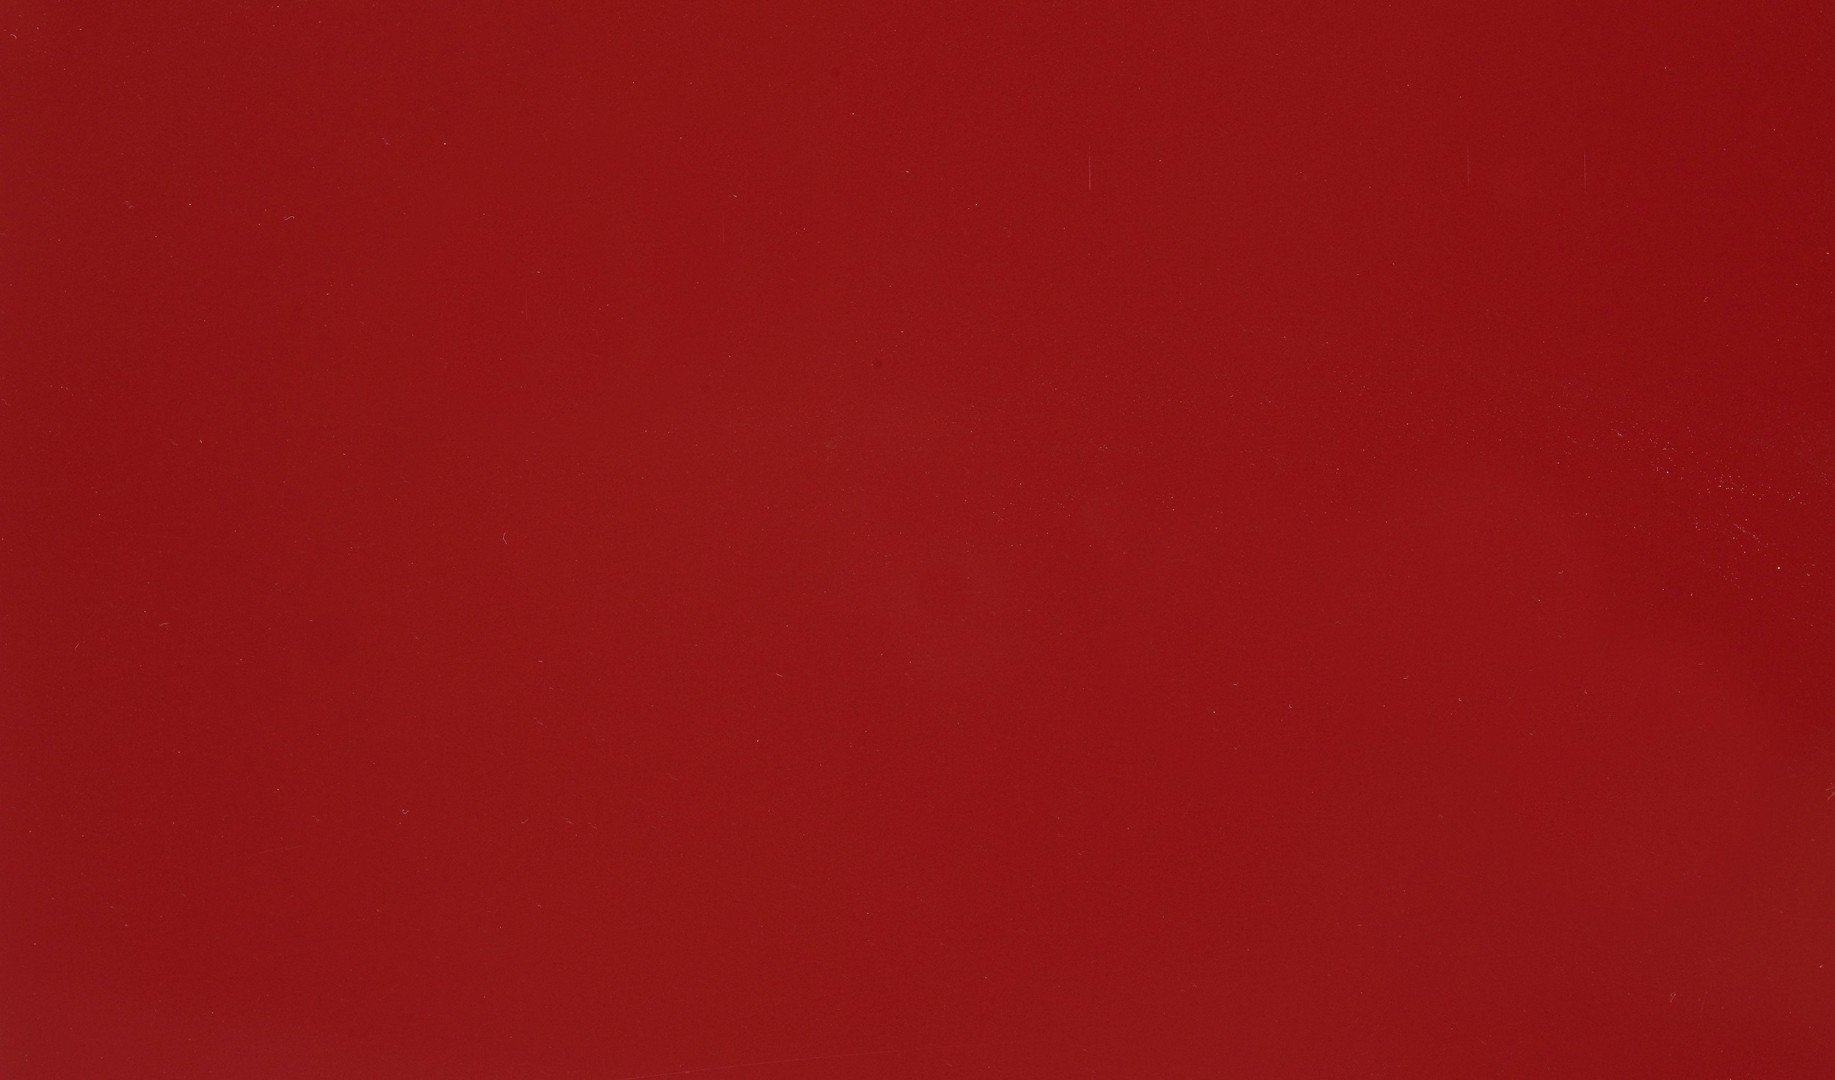 МЕТАЛЛОЧЕРЕПИЦА стандарт полиэстер одностороннее 0,50 мм цвет  3005, 6005, 8017.